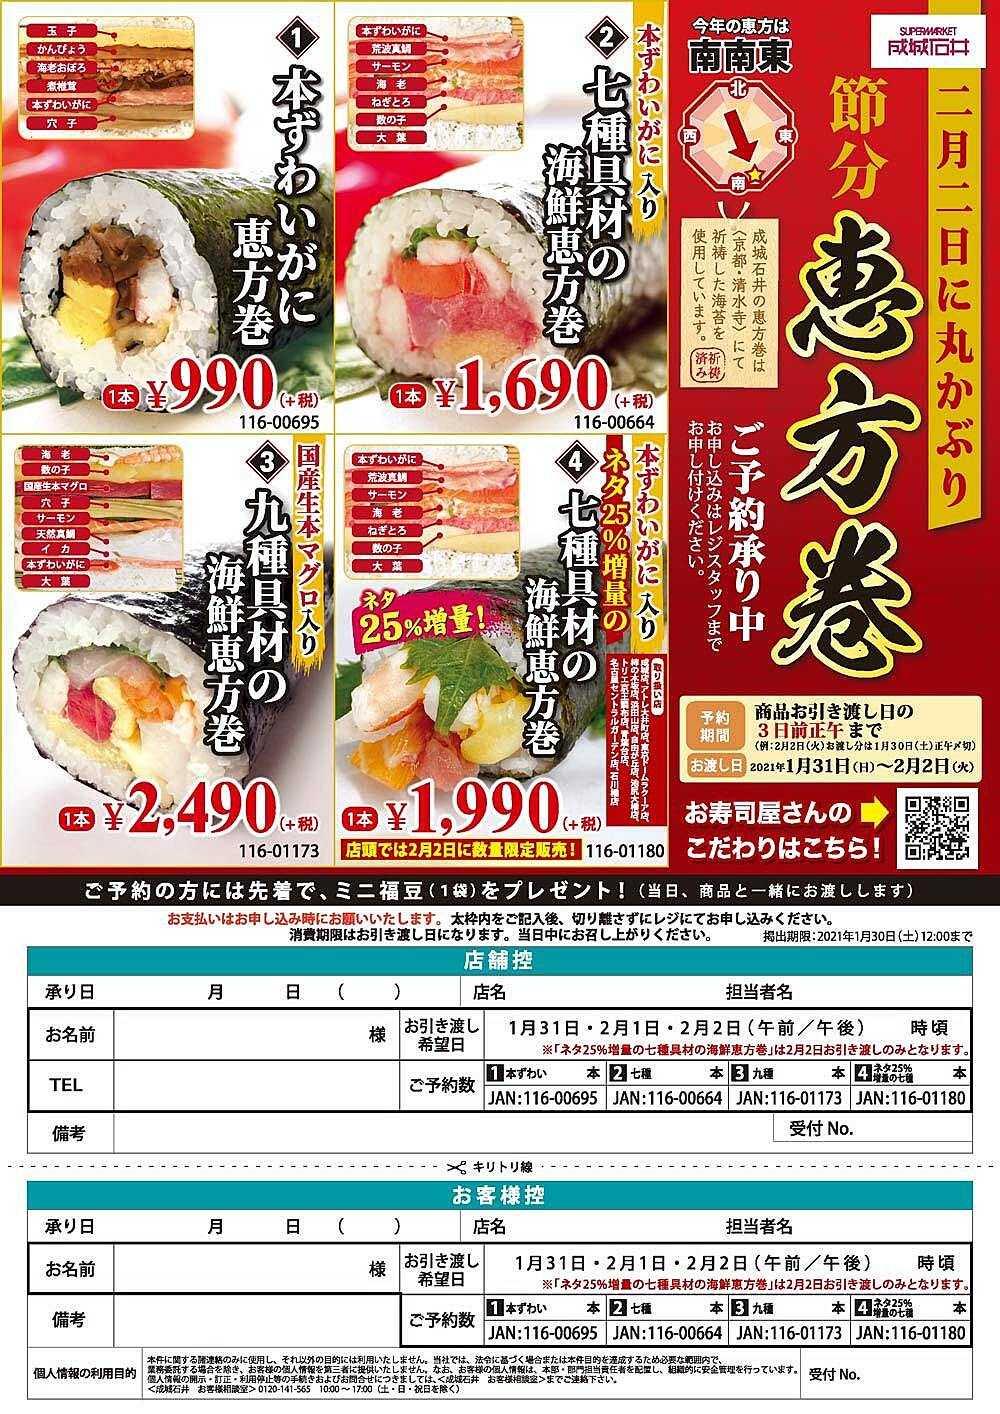 成城石井 2021年<恵方巻>ご予約承り中!